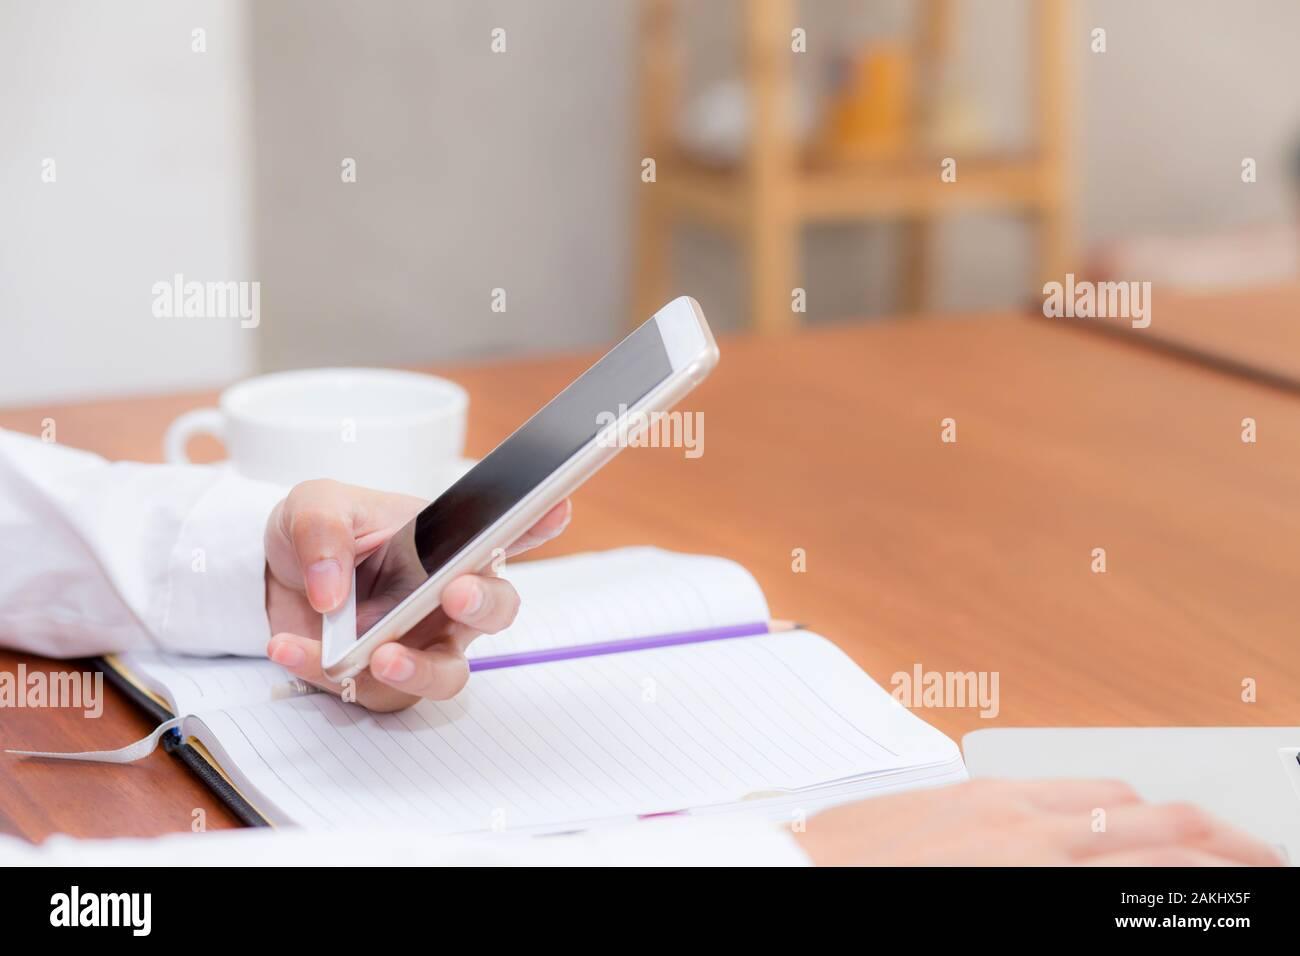 Female smart textmate Textmate ta